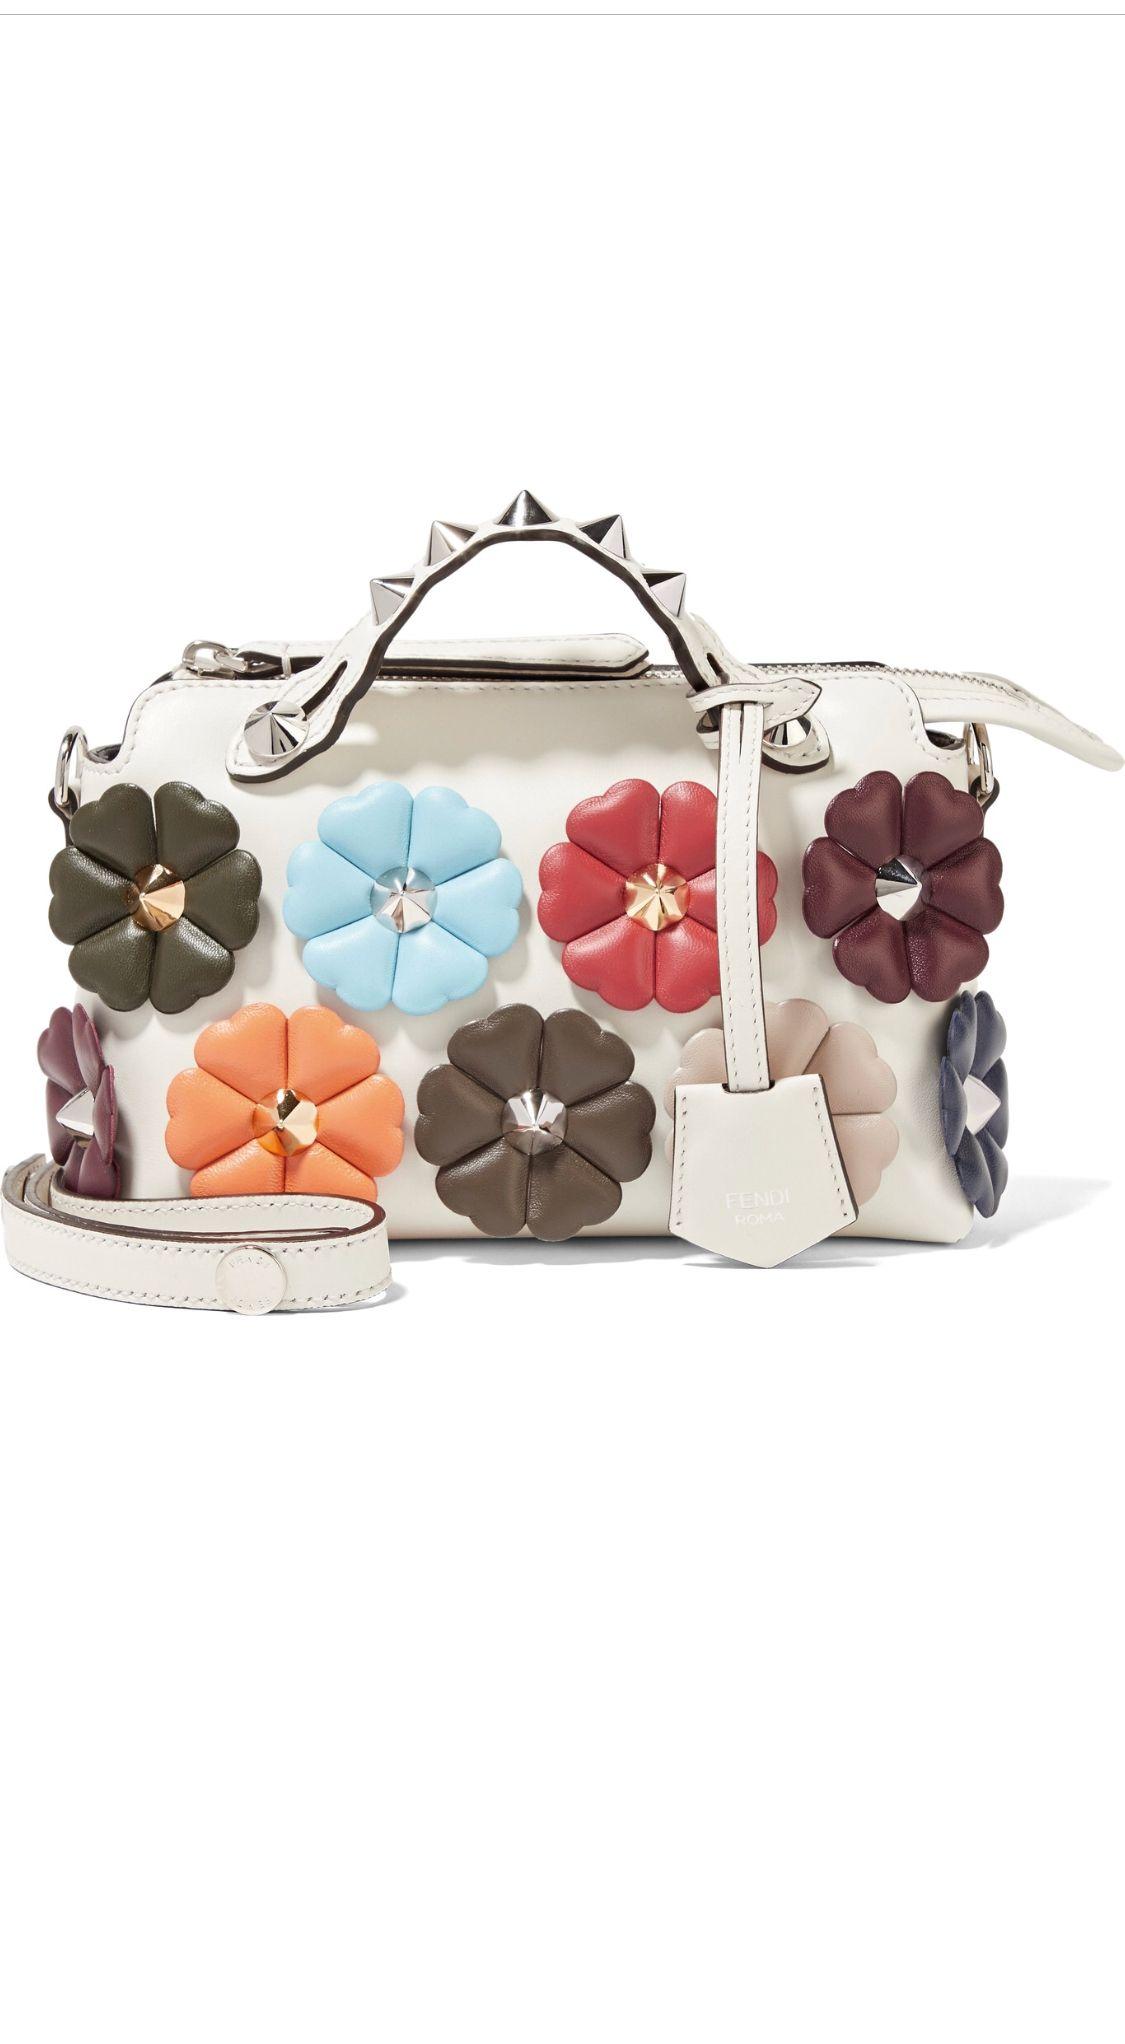 10724233ba2 Pin by Alz Marroquin on Bag//Clutch | Fendi bags, Fendi, Top ...